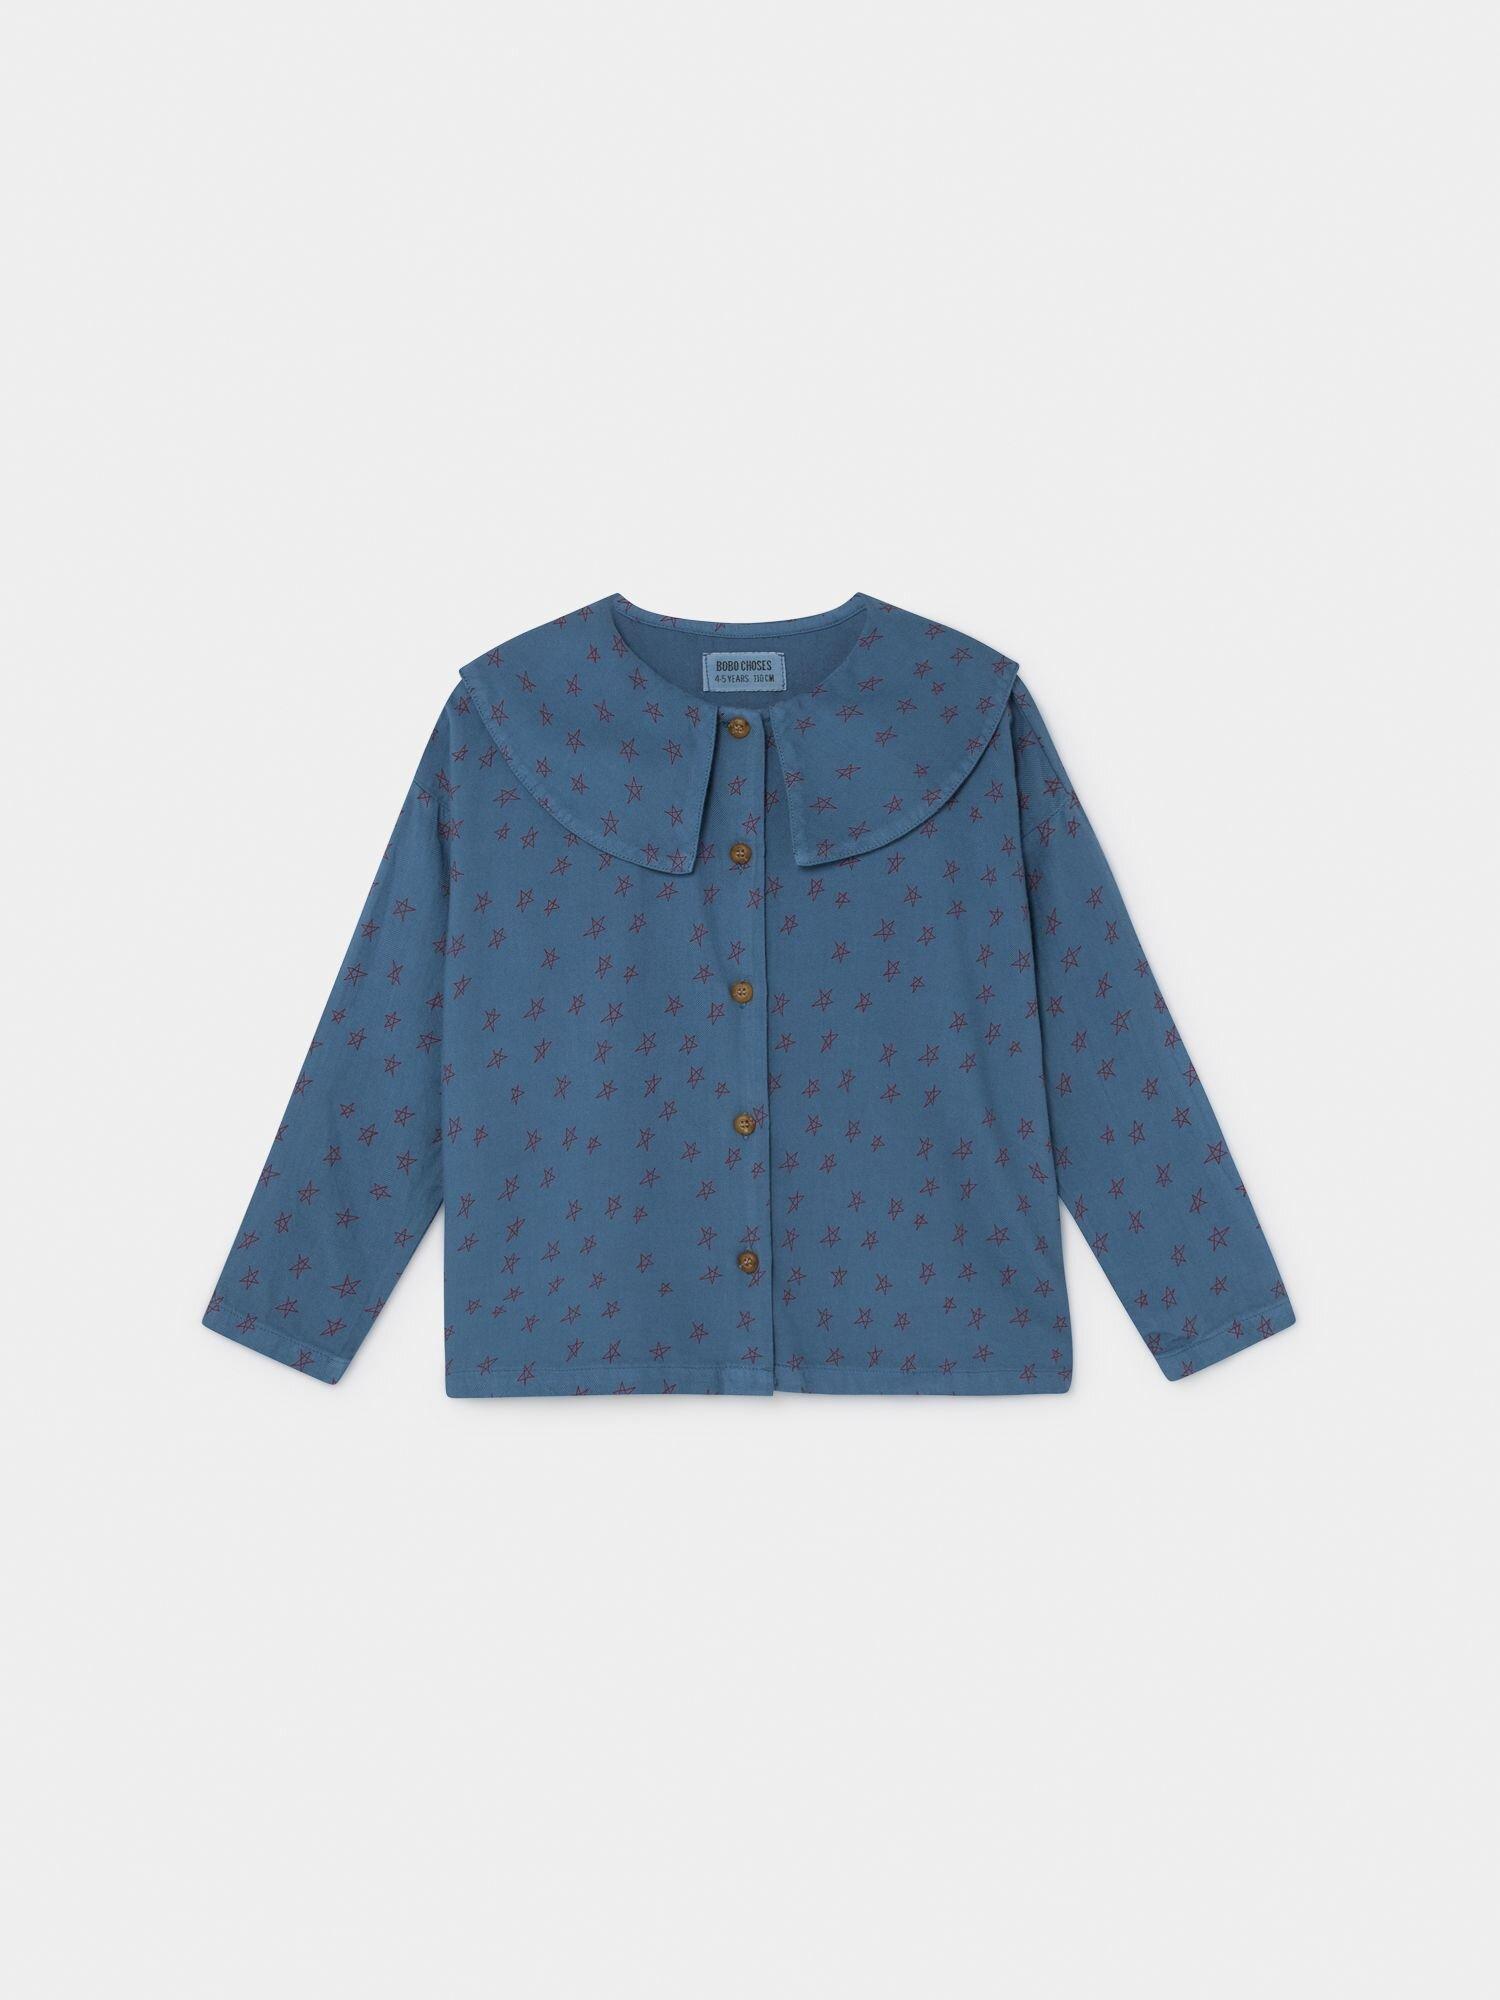 Bobo Choses blouse.jpg